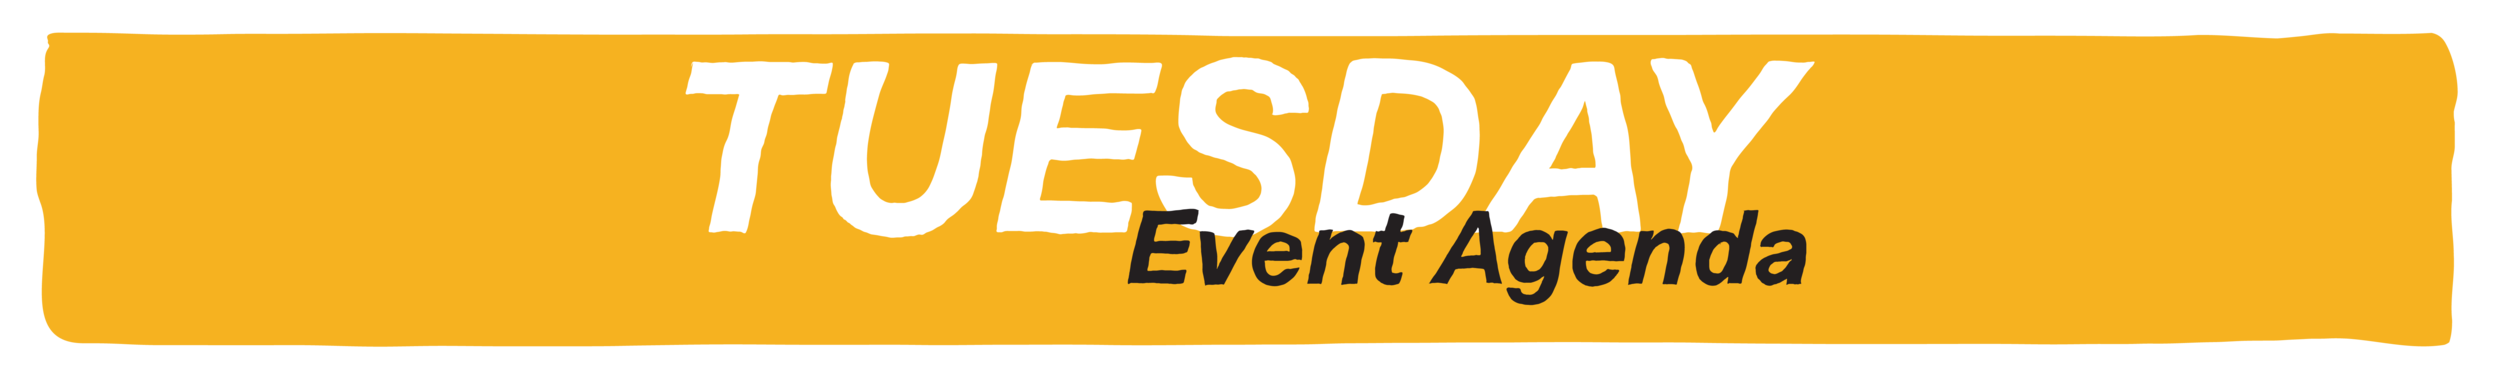 Event Agenda-08.png